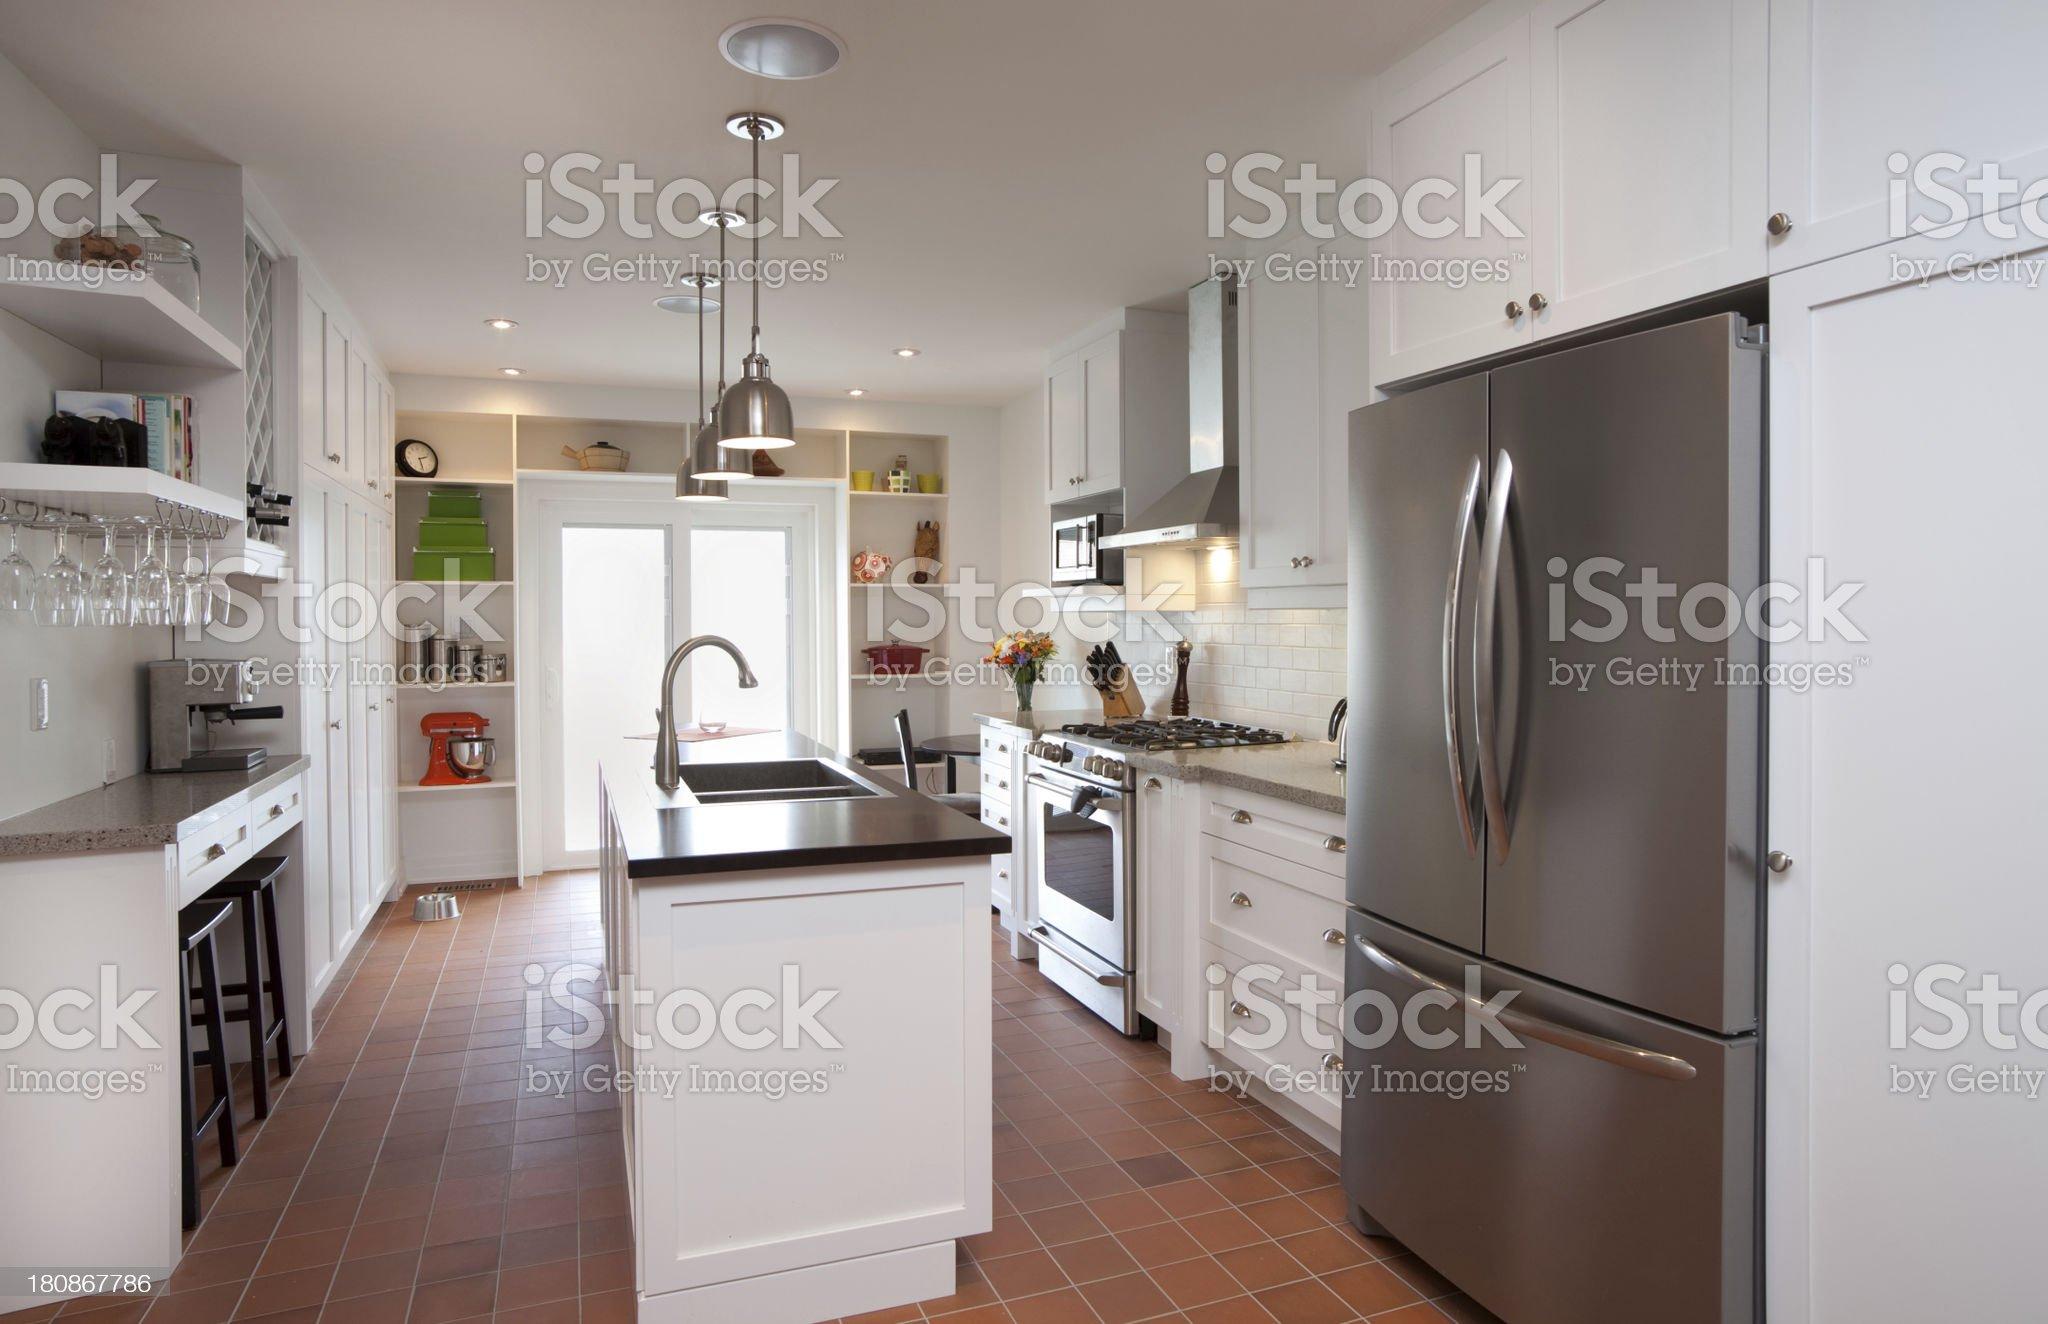 Domestic Kitchen royalty-free stock photo